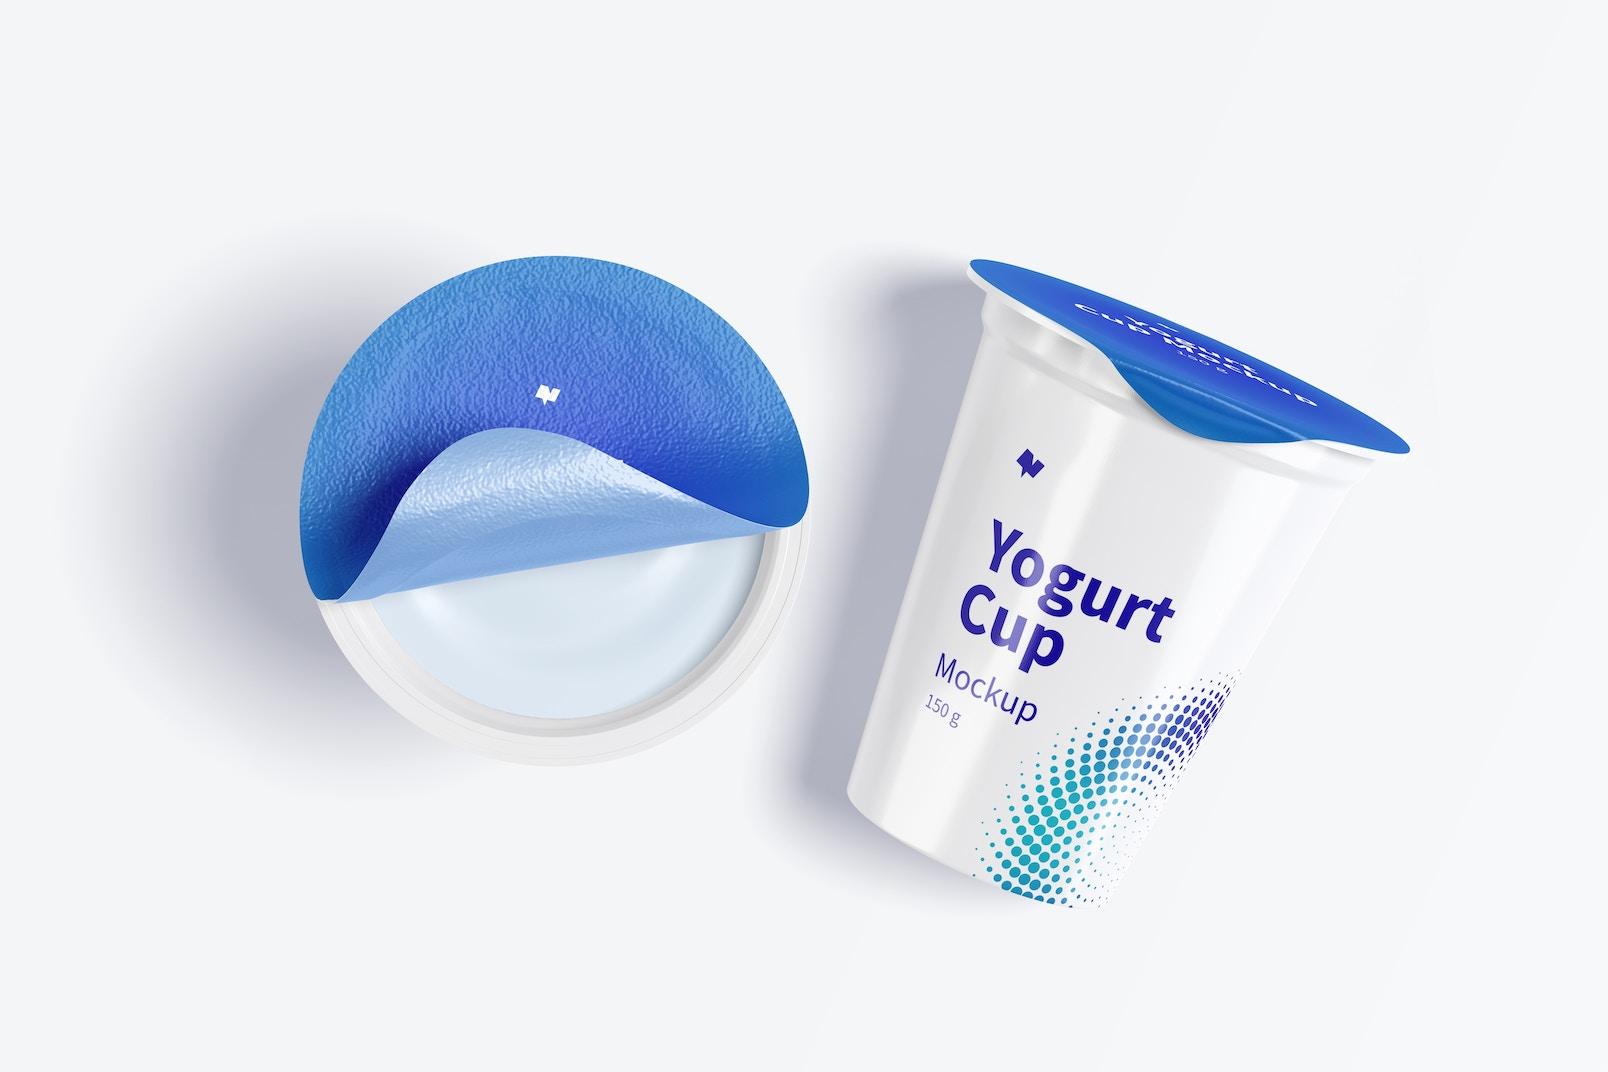 150 g Yogurt Cups Mockup, Top View